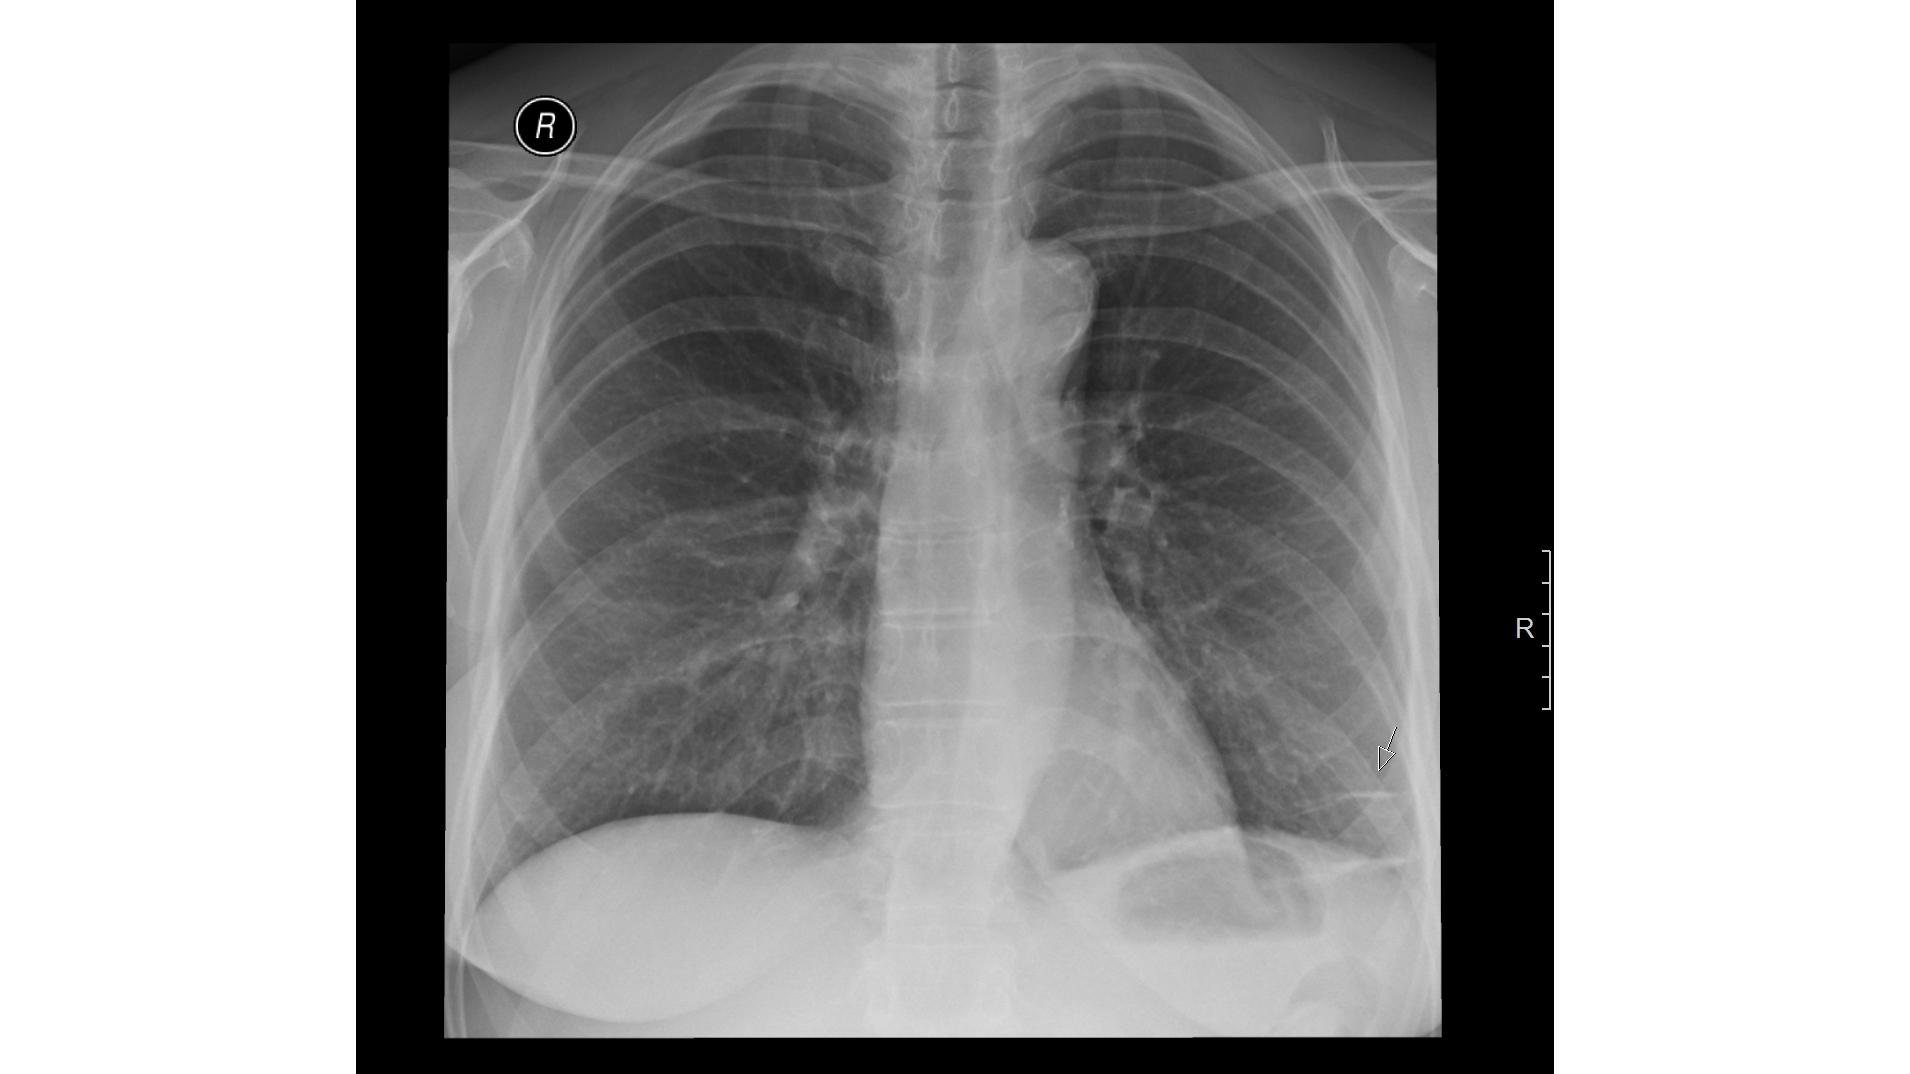 Рентгеновский снимок лёгких пациента с фиброзом. Фото © radiomed.ru